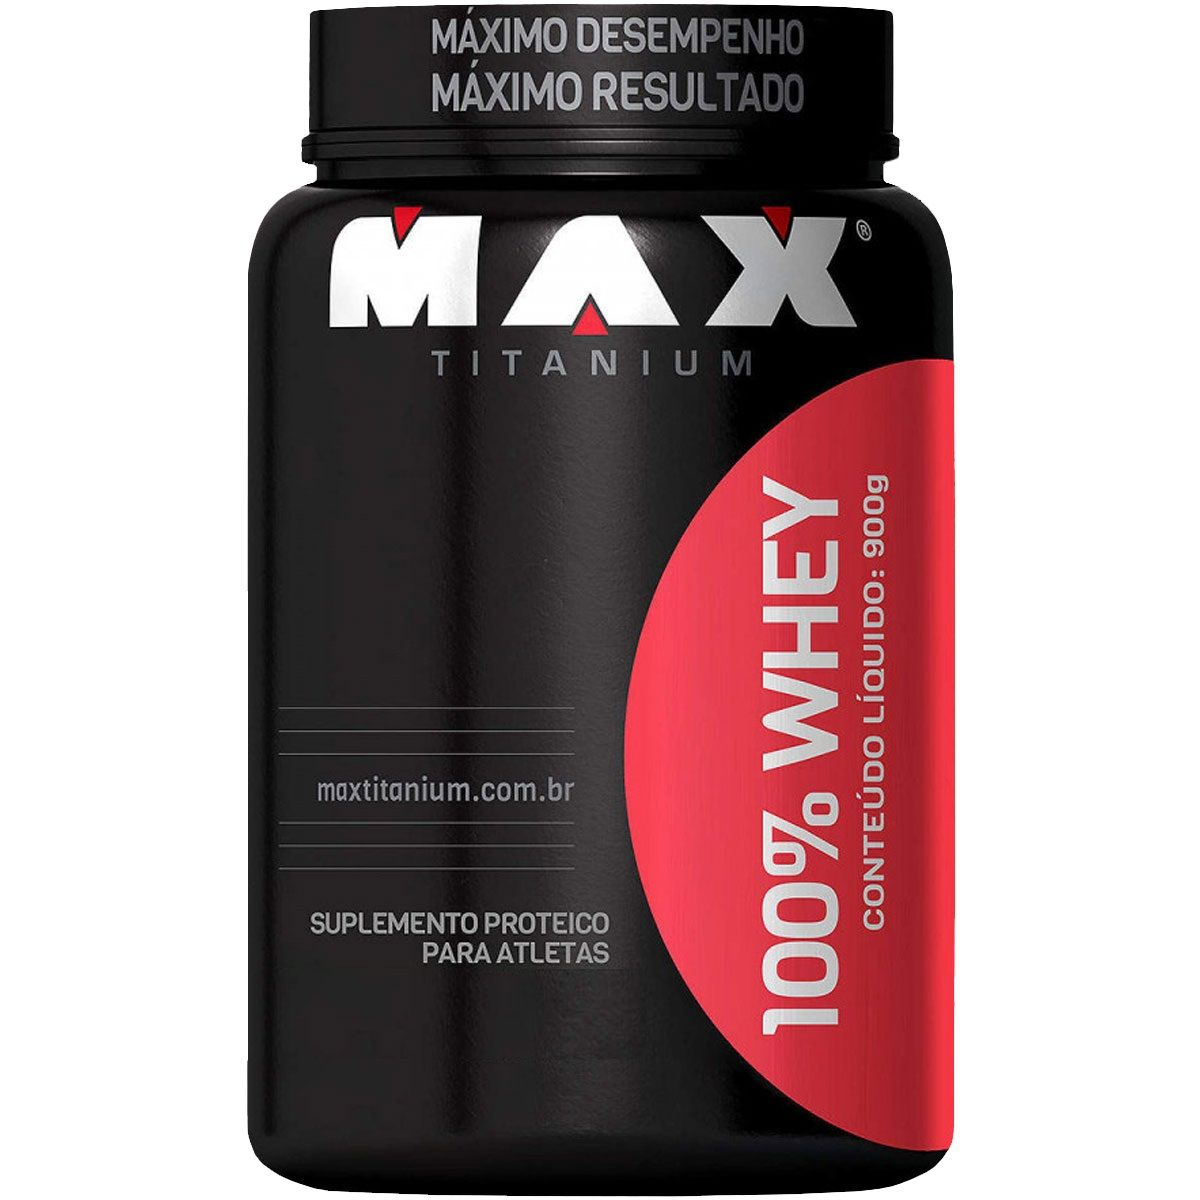 Whey Protein Concentrado 100% WHEY 900g - Morango -  Max Titanium